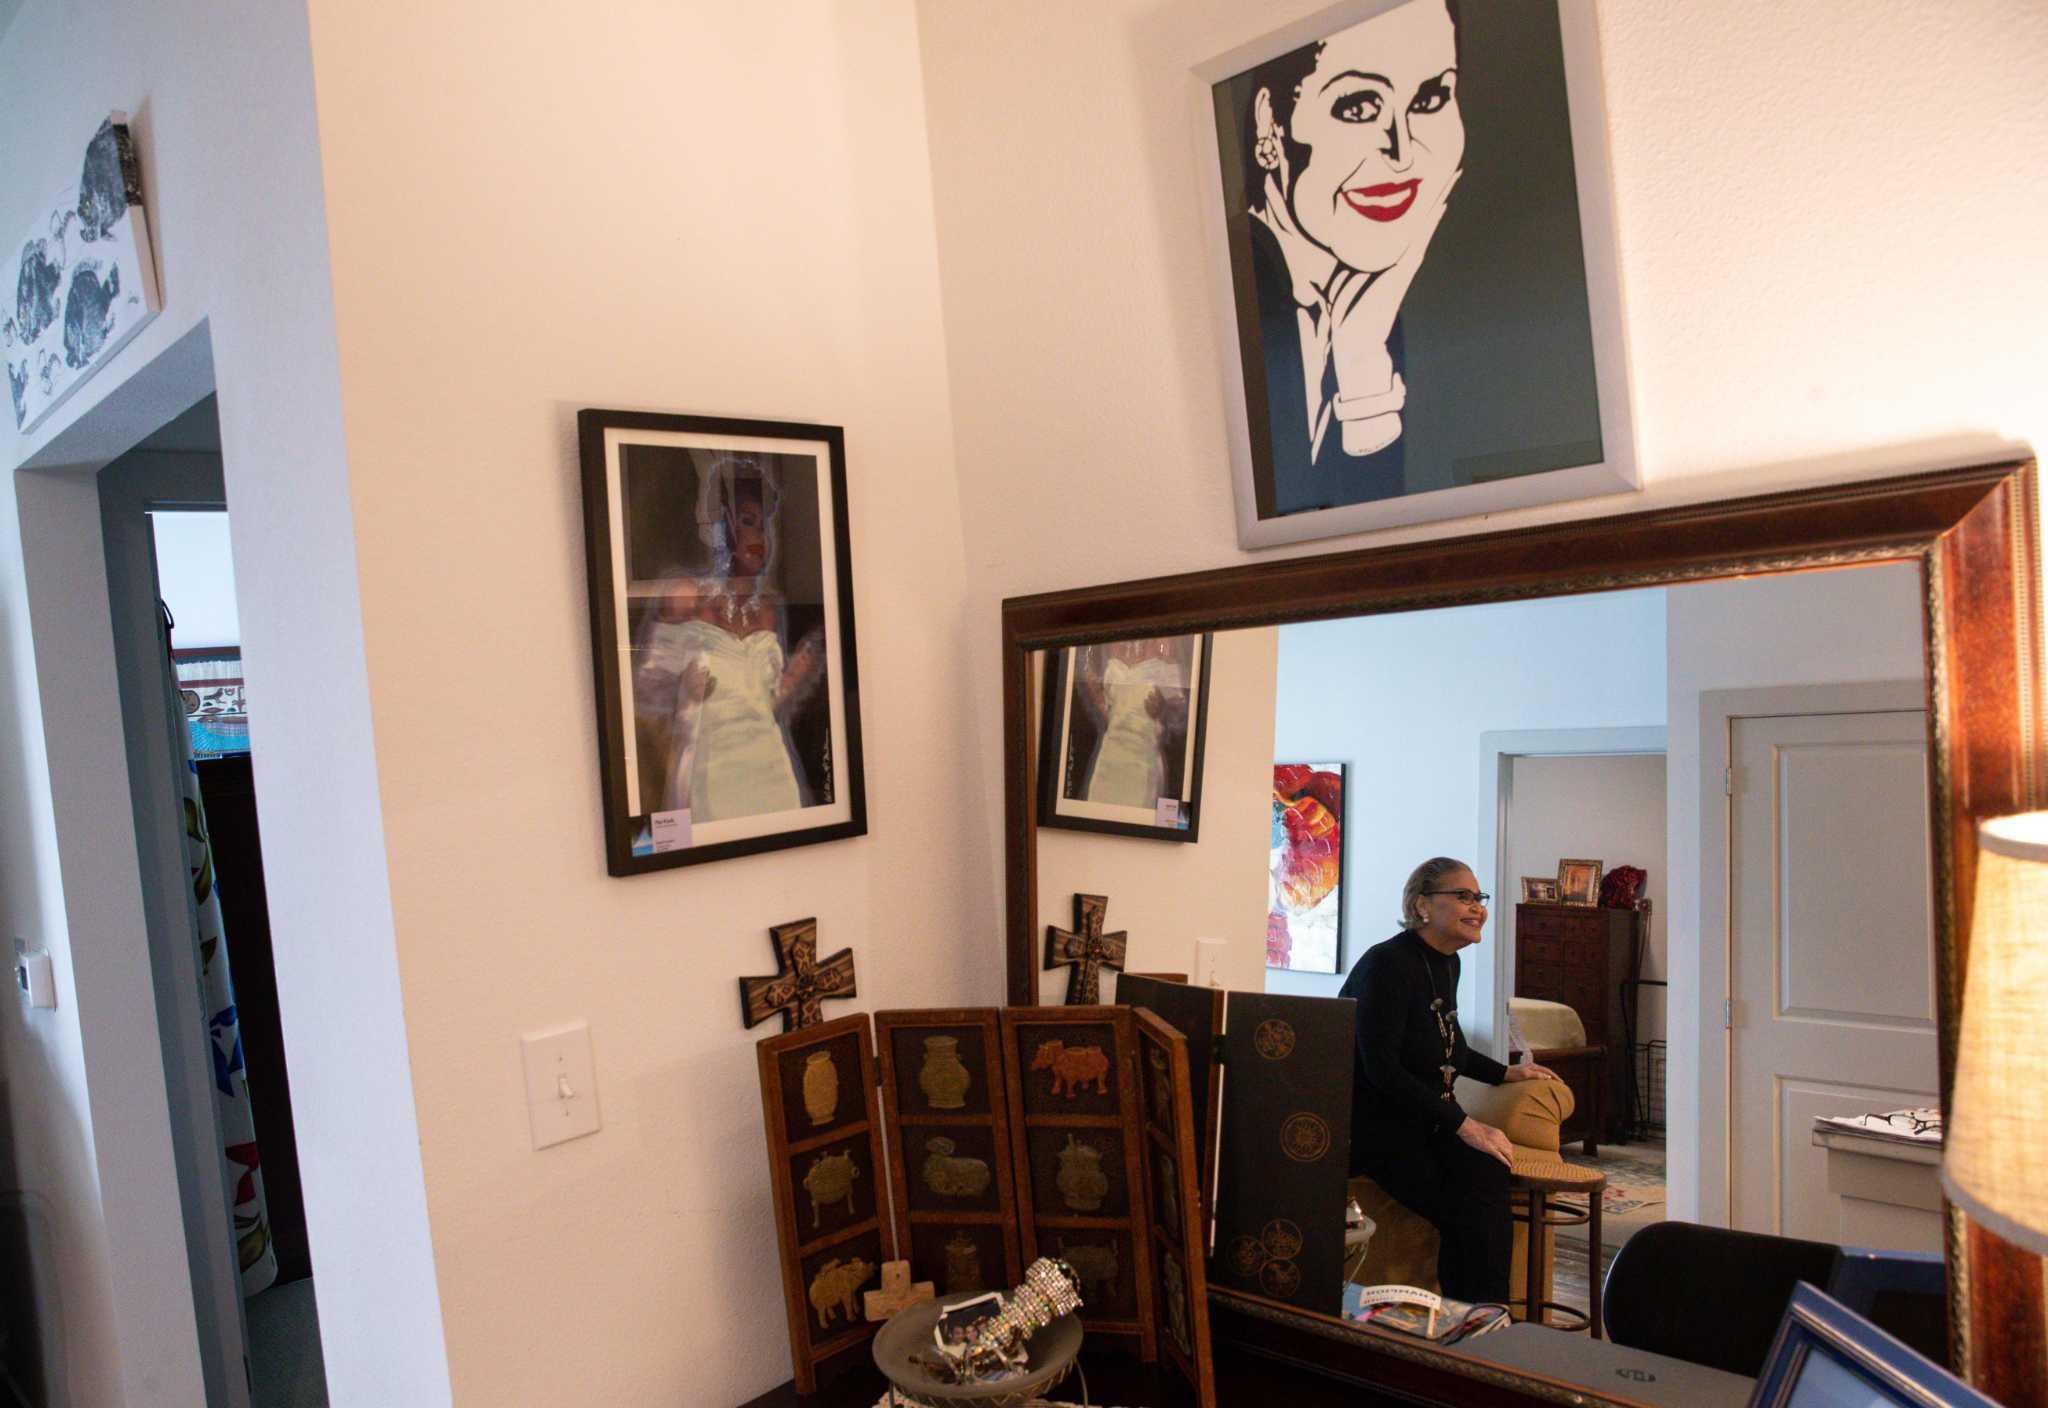 LGBTQ seniors get affordable, 'affirming' home in Law Harrington Senior Living Center